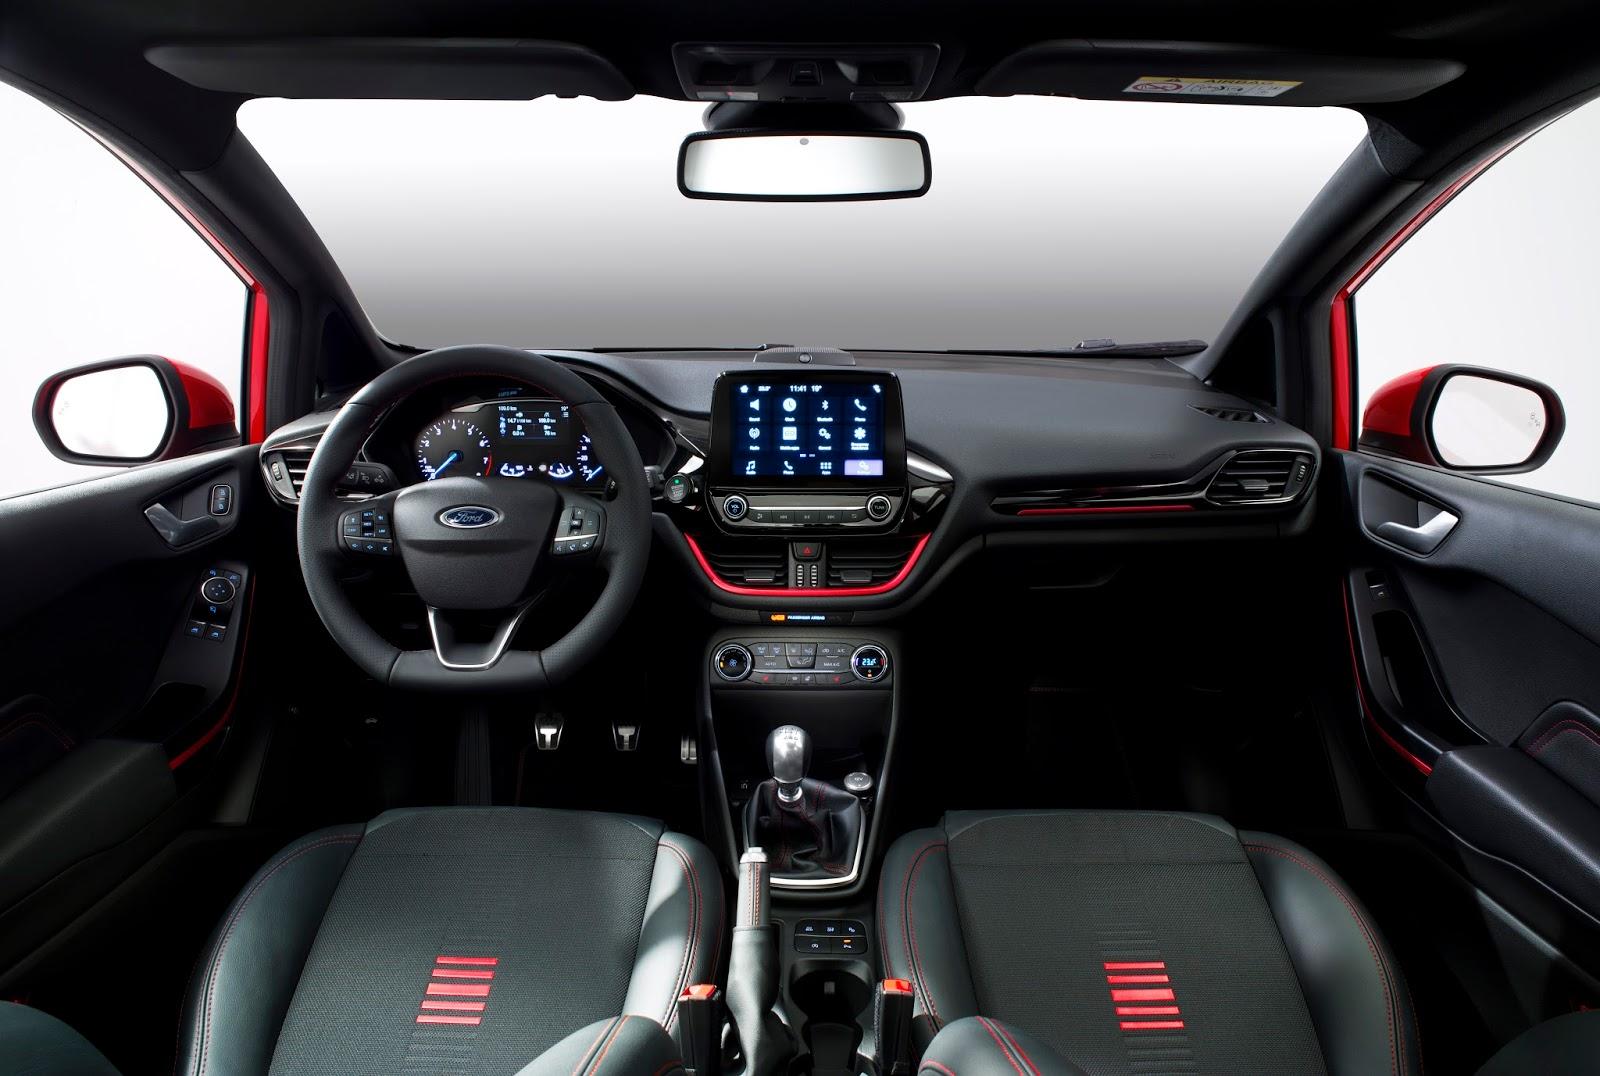 FORD FIESTA2016 ST LINE CENTER COCKPIT 03 Τα πρώτα Ford Fiesta έρχονται στην Ελλάδα, με τιμή από 12.990€ Bestseller, Ford, Ford Fiesta, supermini, Λανσάρισμα